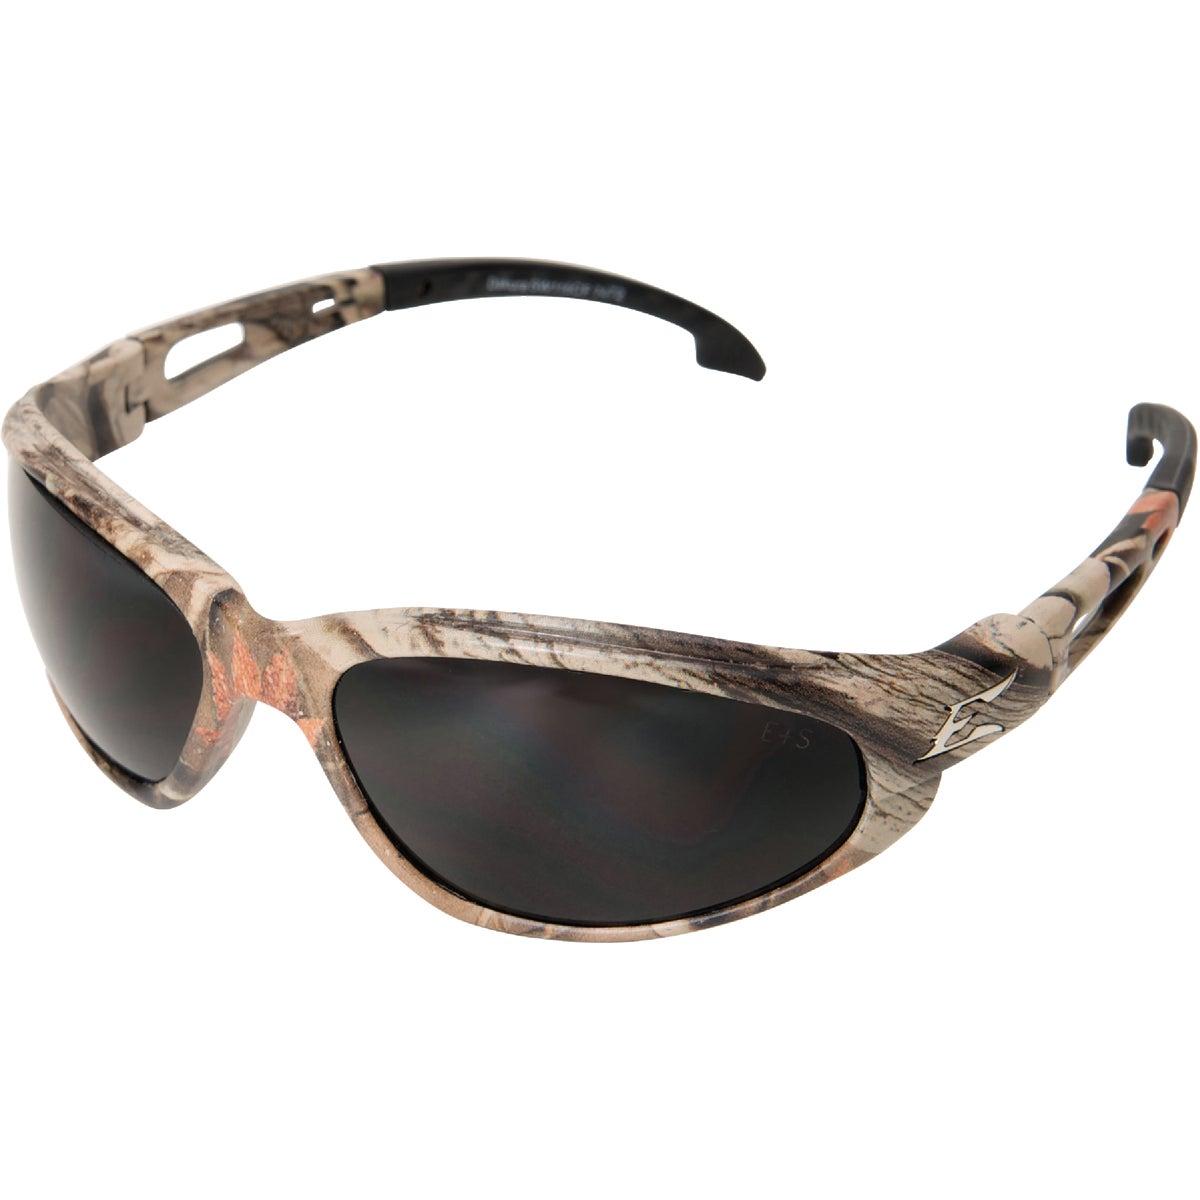 DAKURA POLCAMO/SMK LENS - TSM216CF by Edge Eyewear